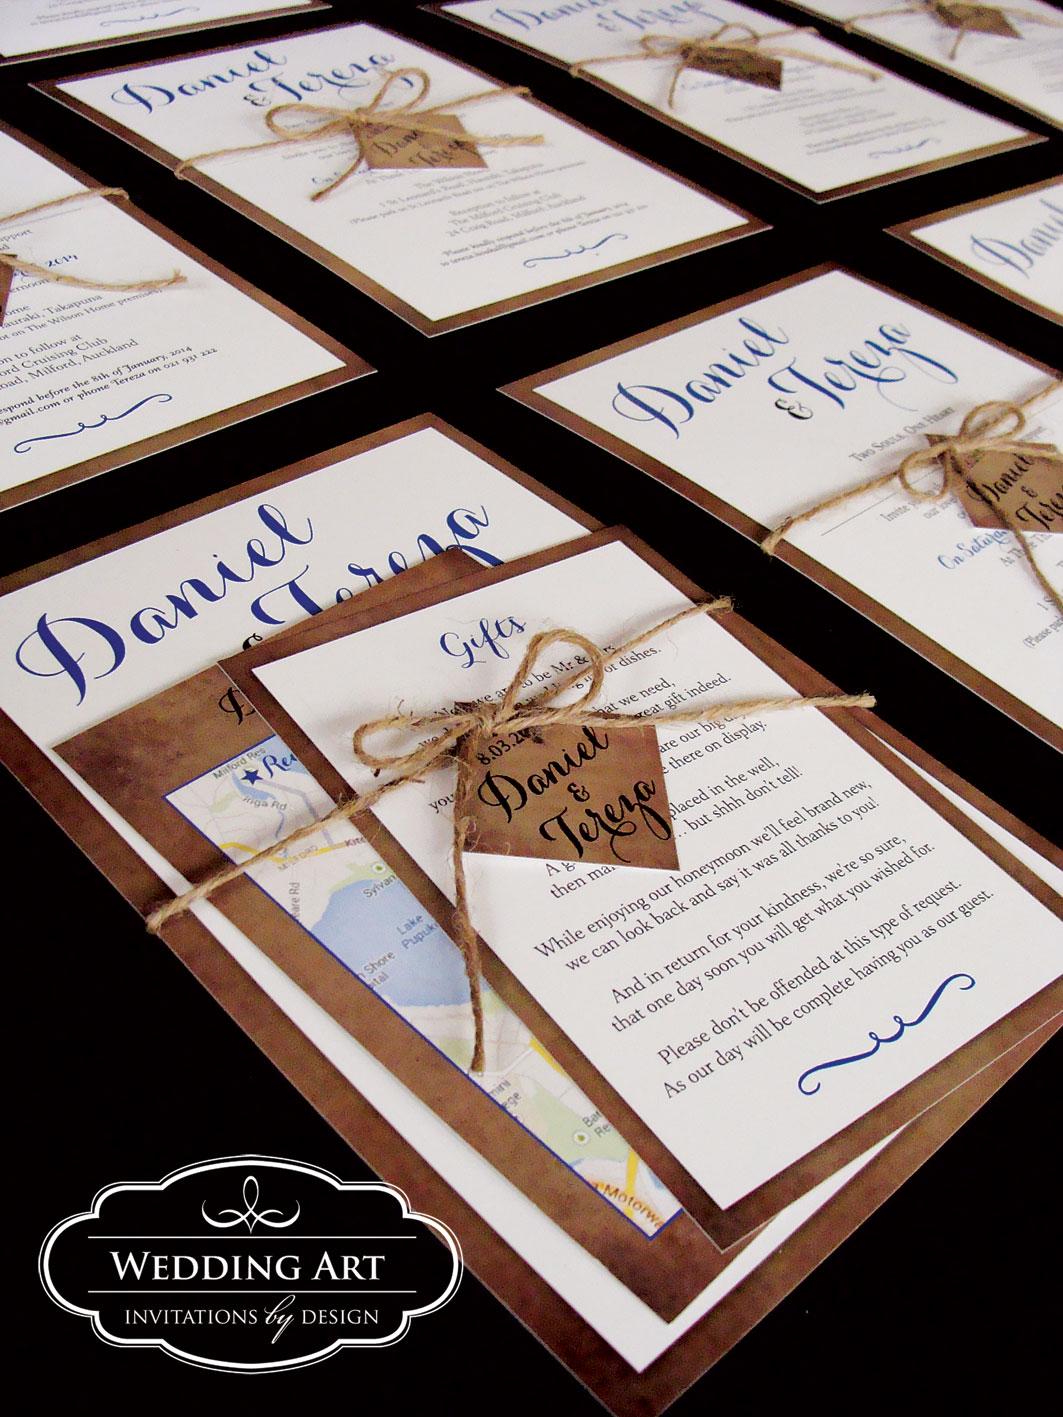 wedding invitations theme nz - 28 images - kiwiana wedding ...